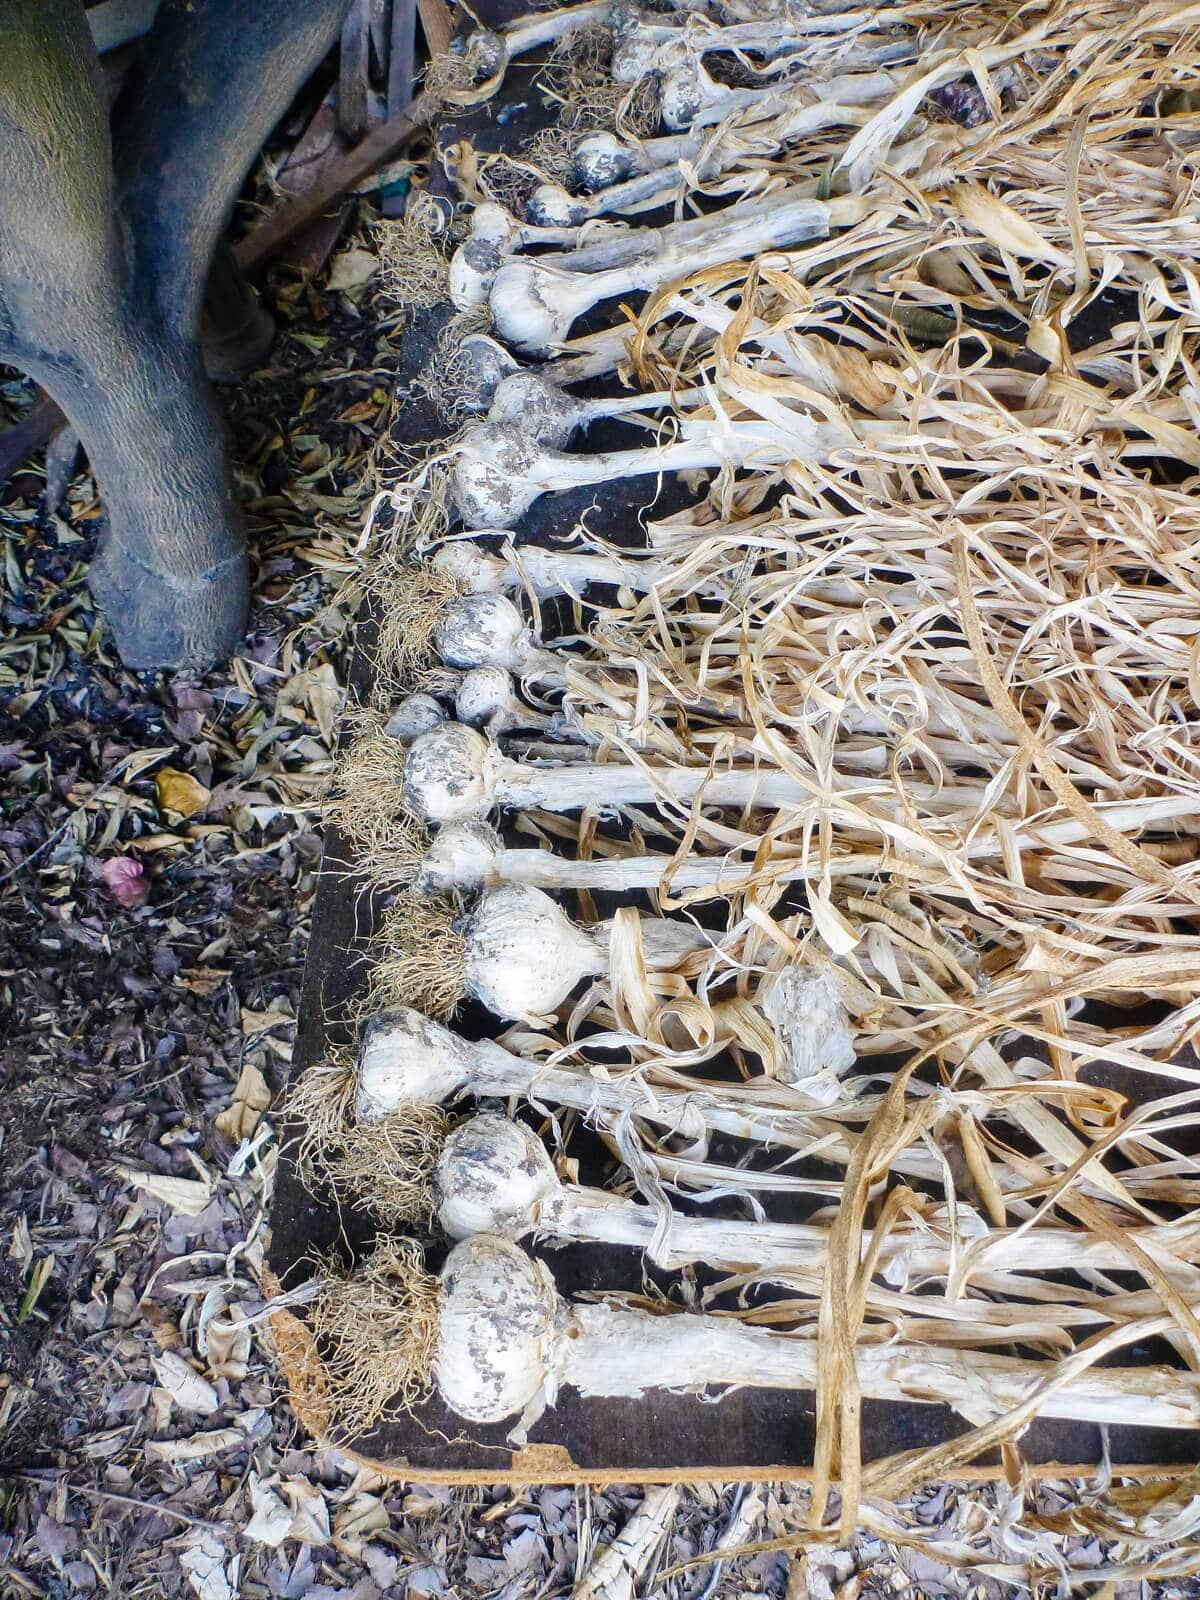 Garlic harvest being cured under a shady tree